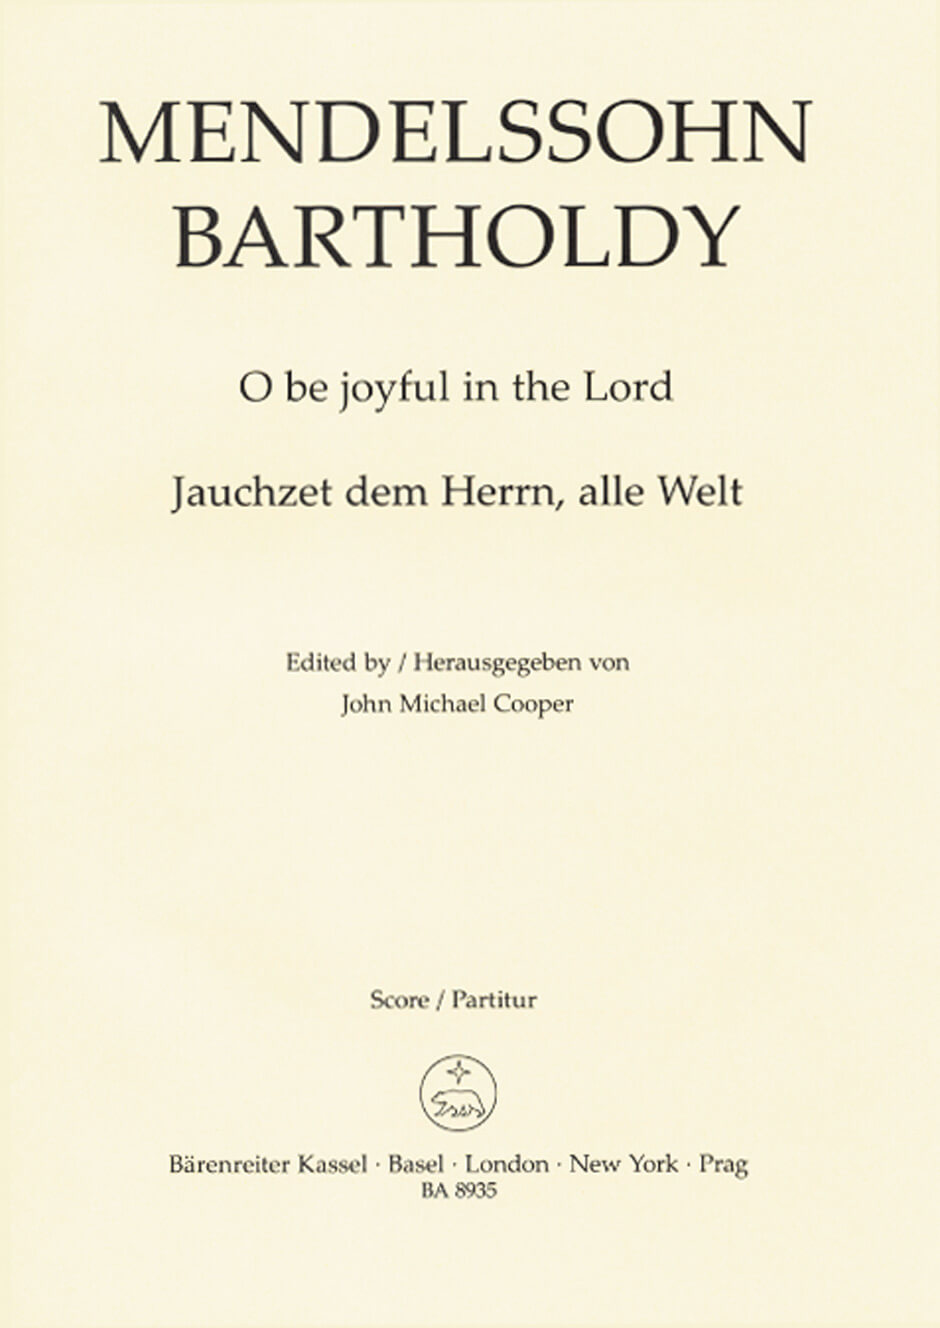 O be joyful in the Lord Op.69 Coral